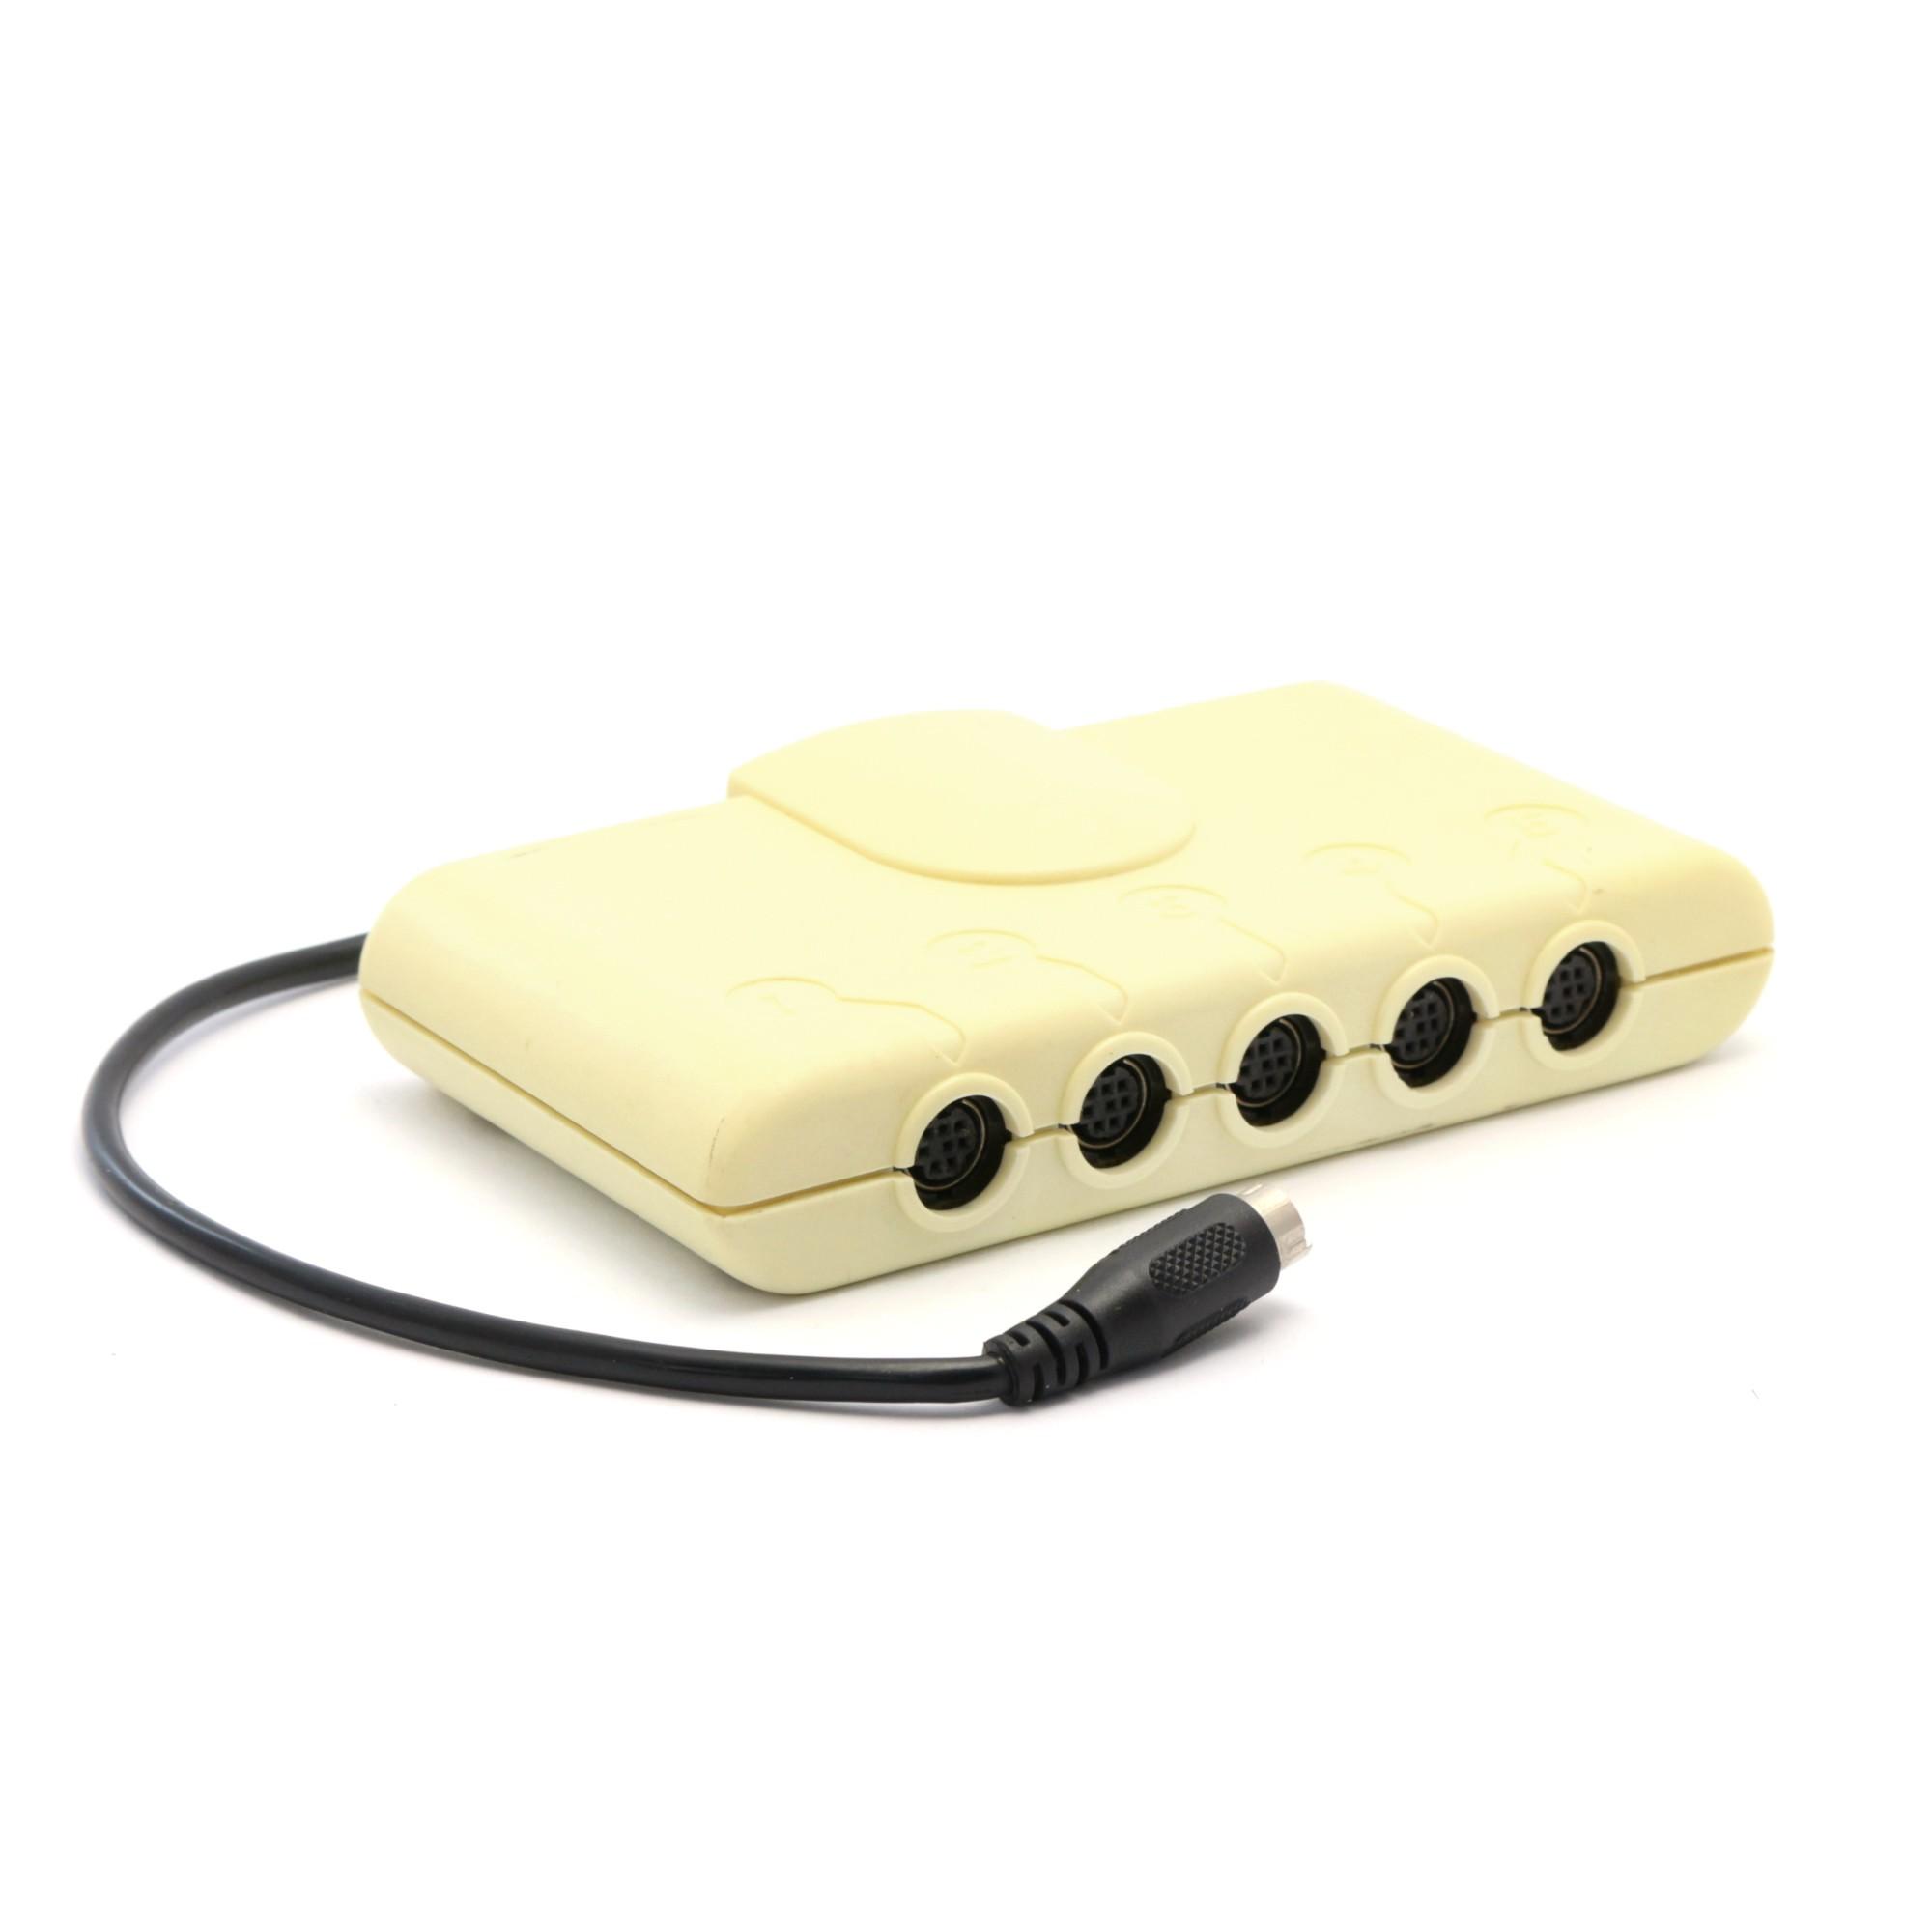 Multitap / 5 Spieler Adapter #Turbo Tap